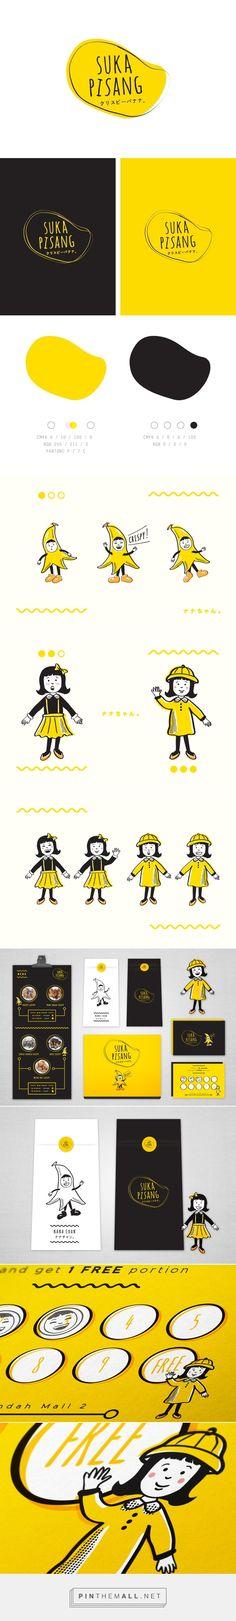 Suka Pisang — Crispy Banana  #branding #illustration #typography